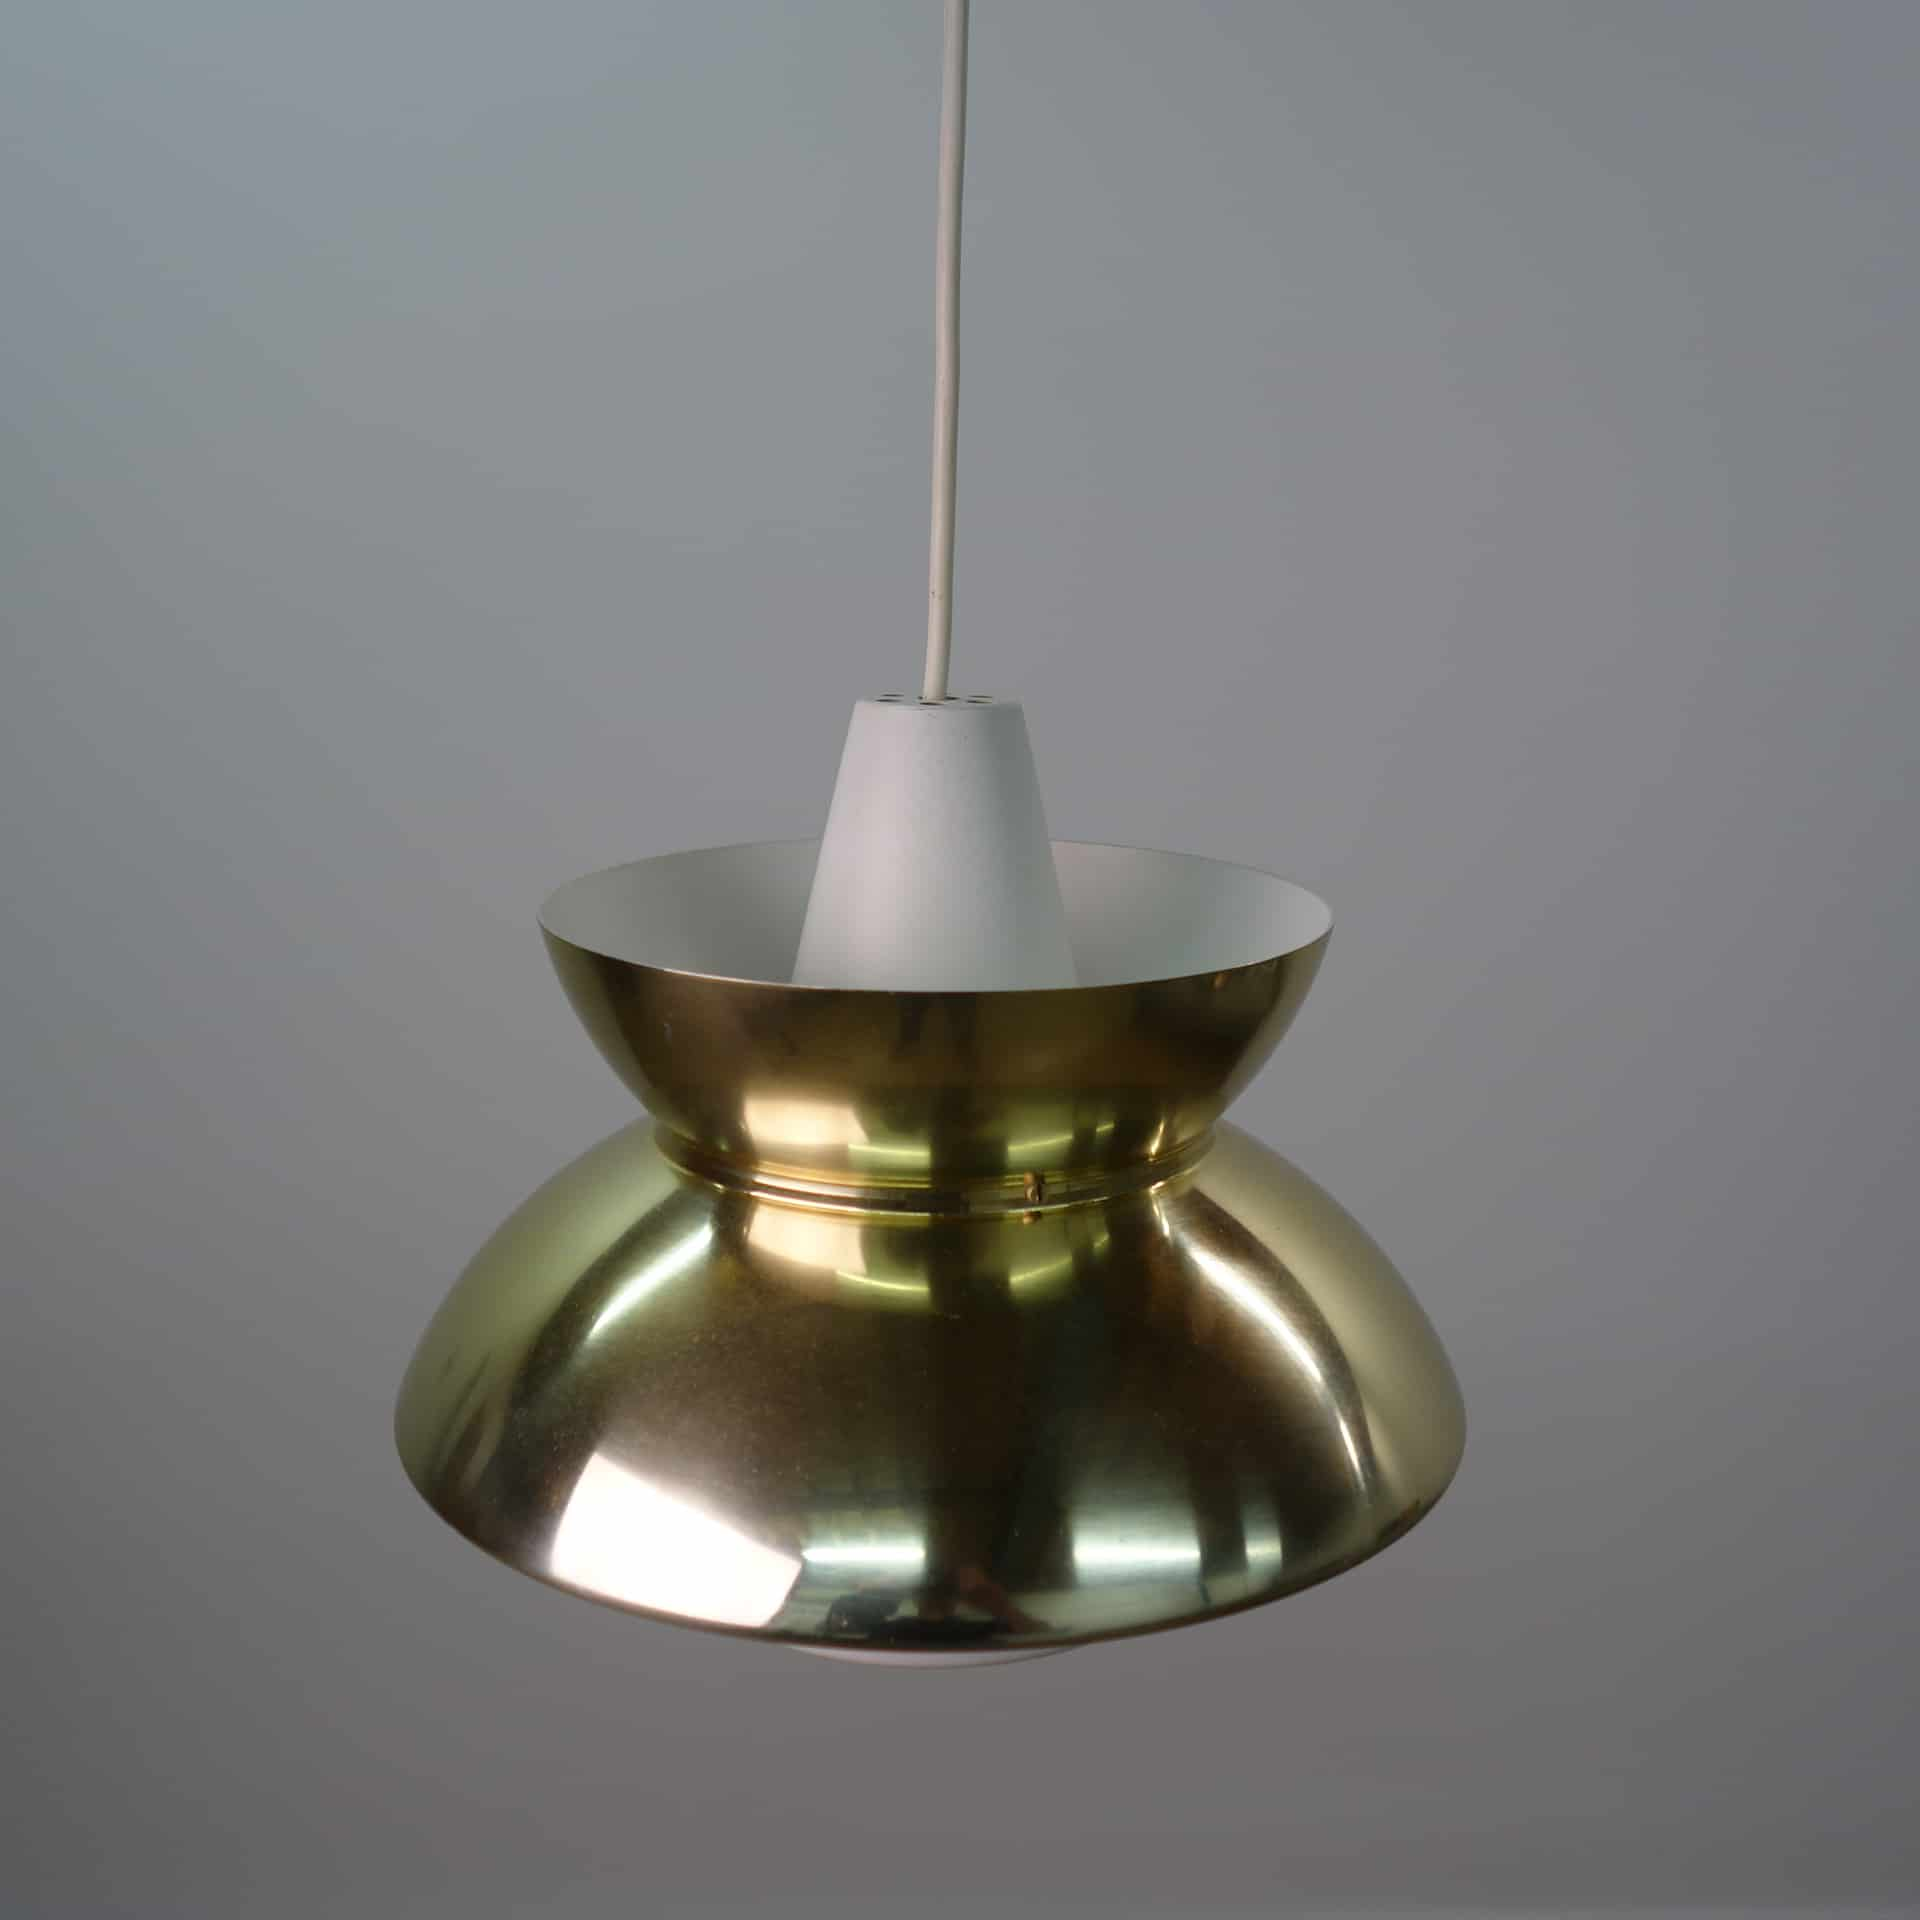 Poulsen style brass pendent light